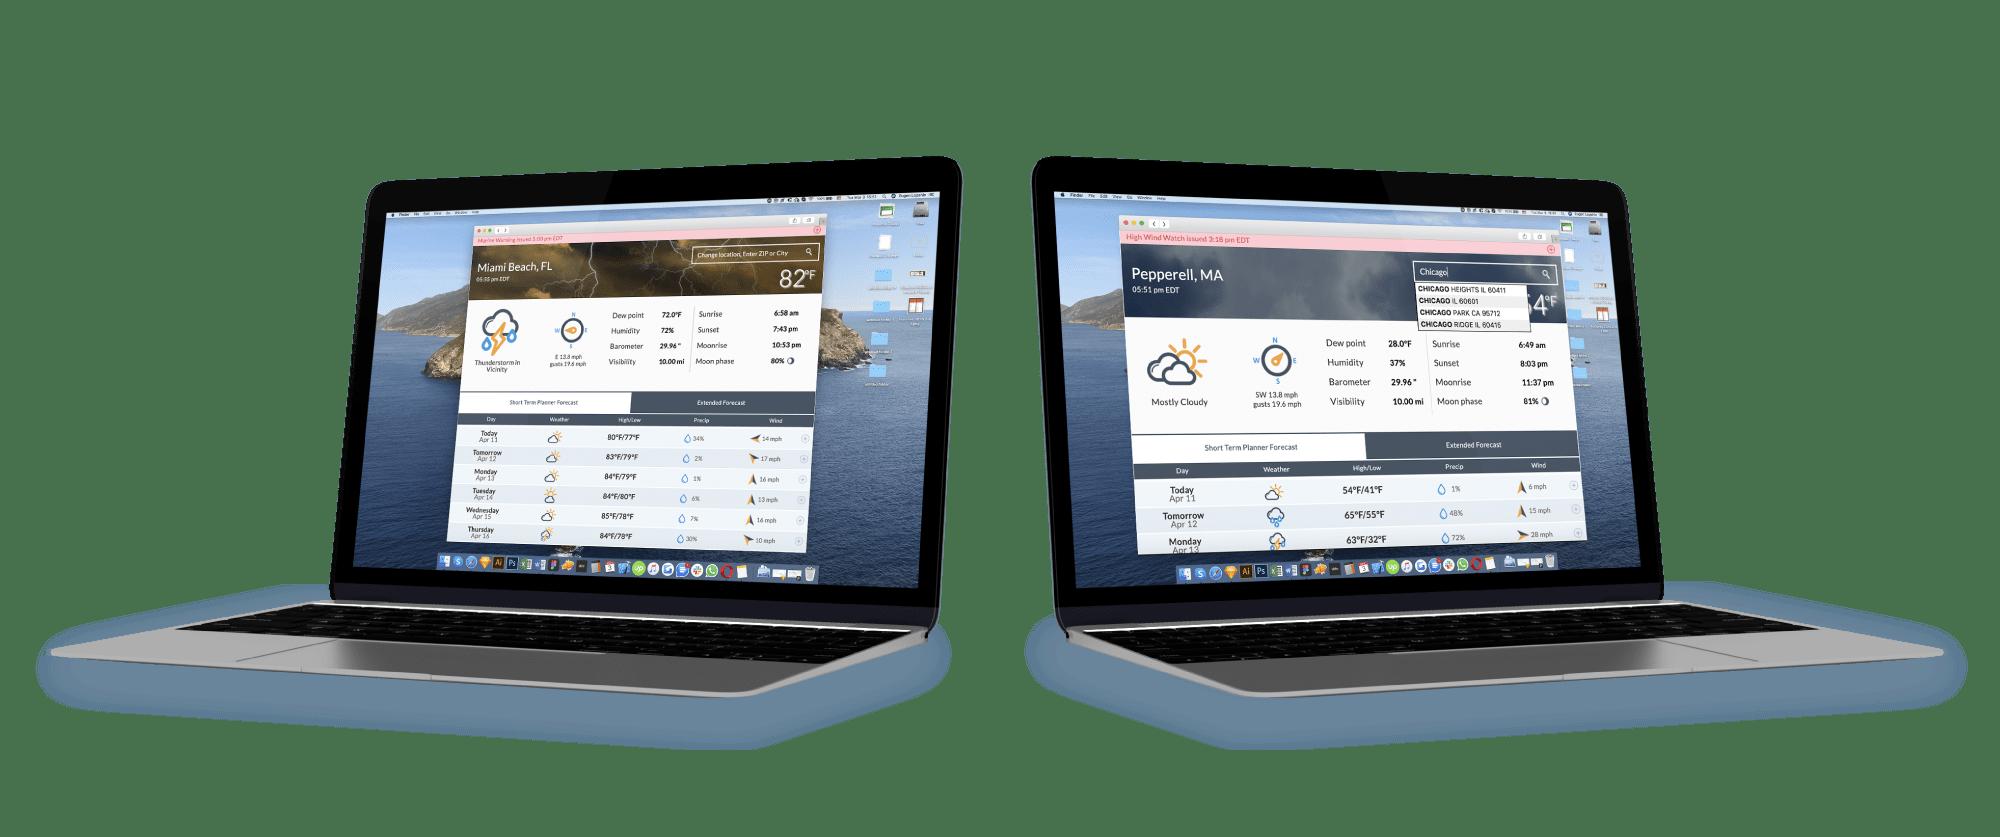 NOAA-Weather solution